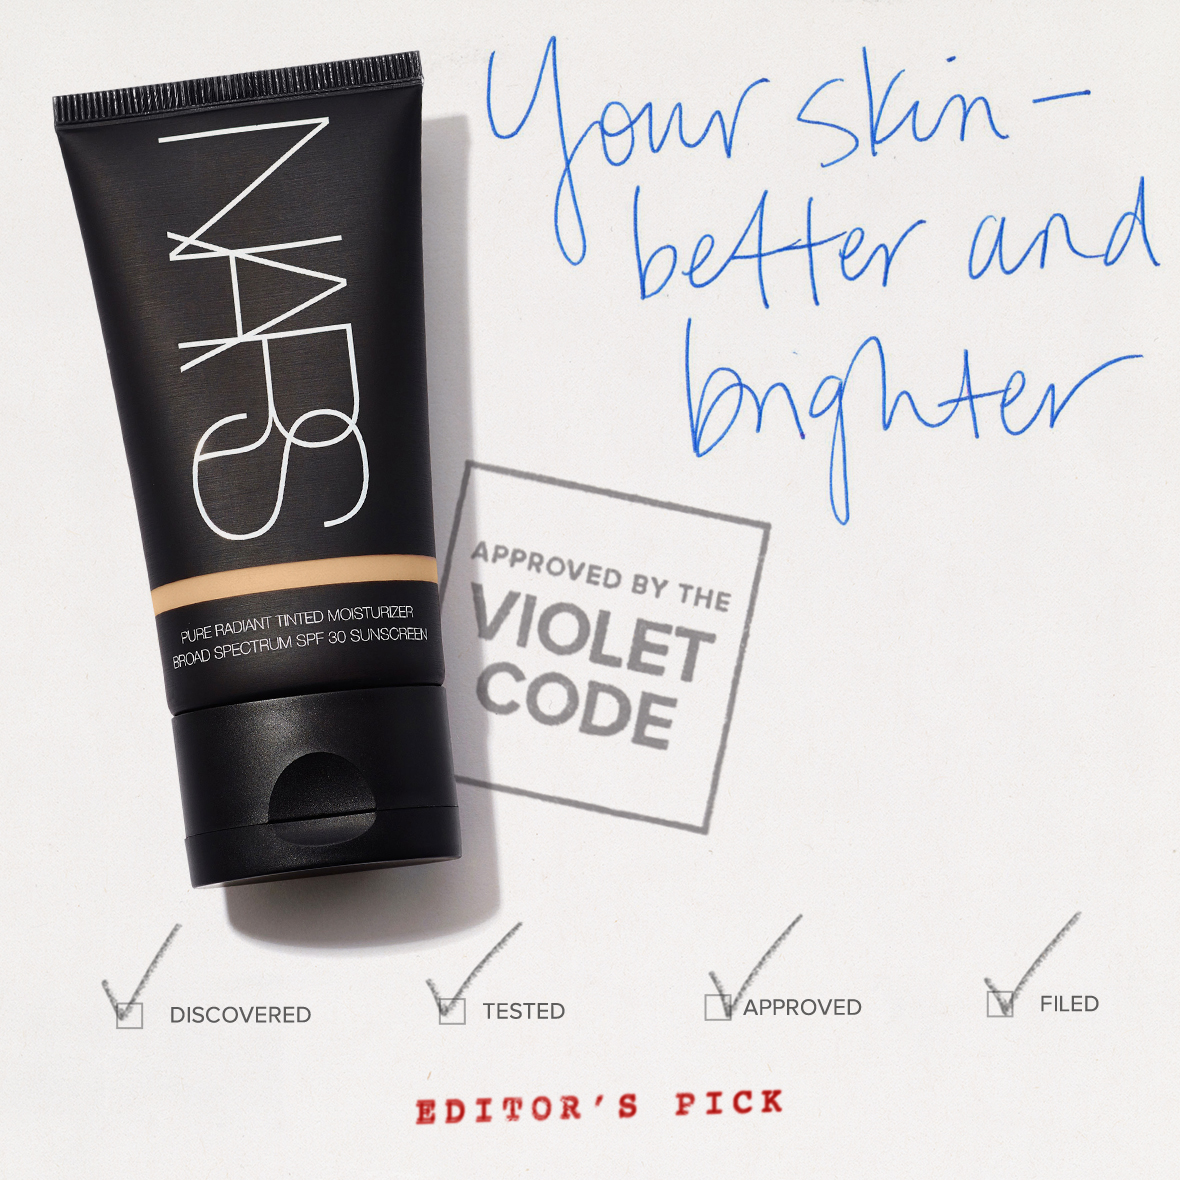 ABTVC-Social-Editors-Pick-nars-radiant-tinted-moisturizer.jpg